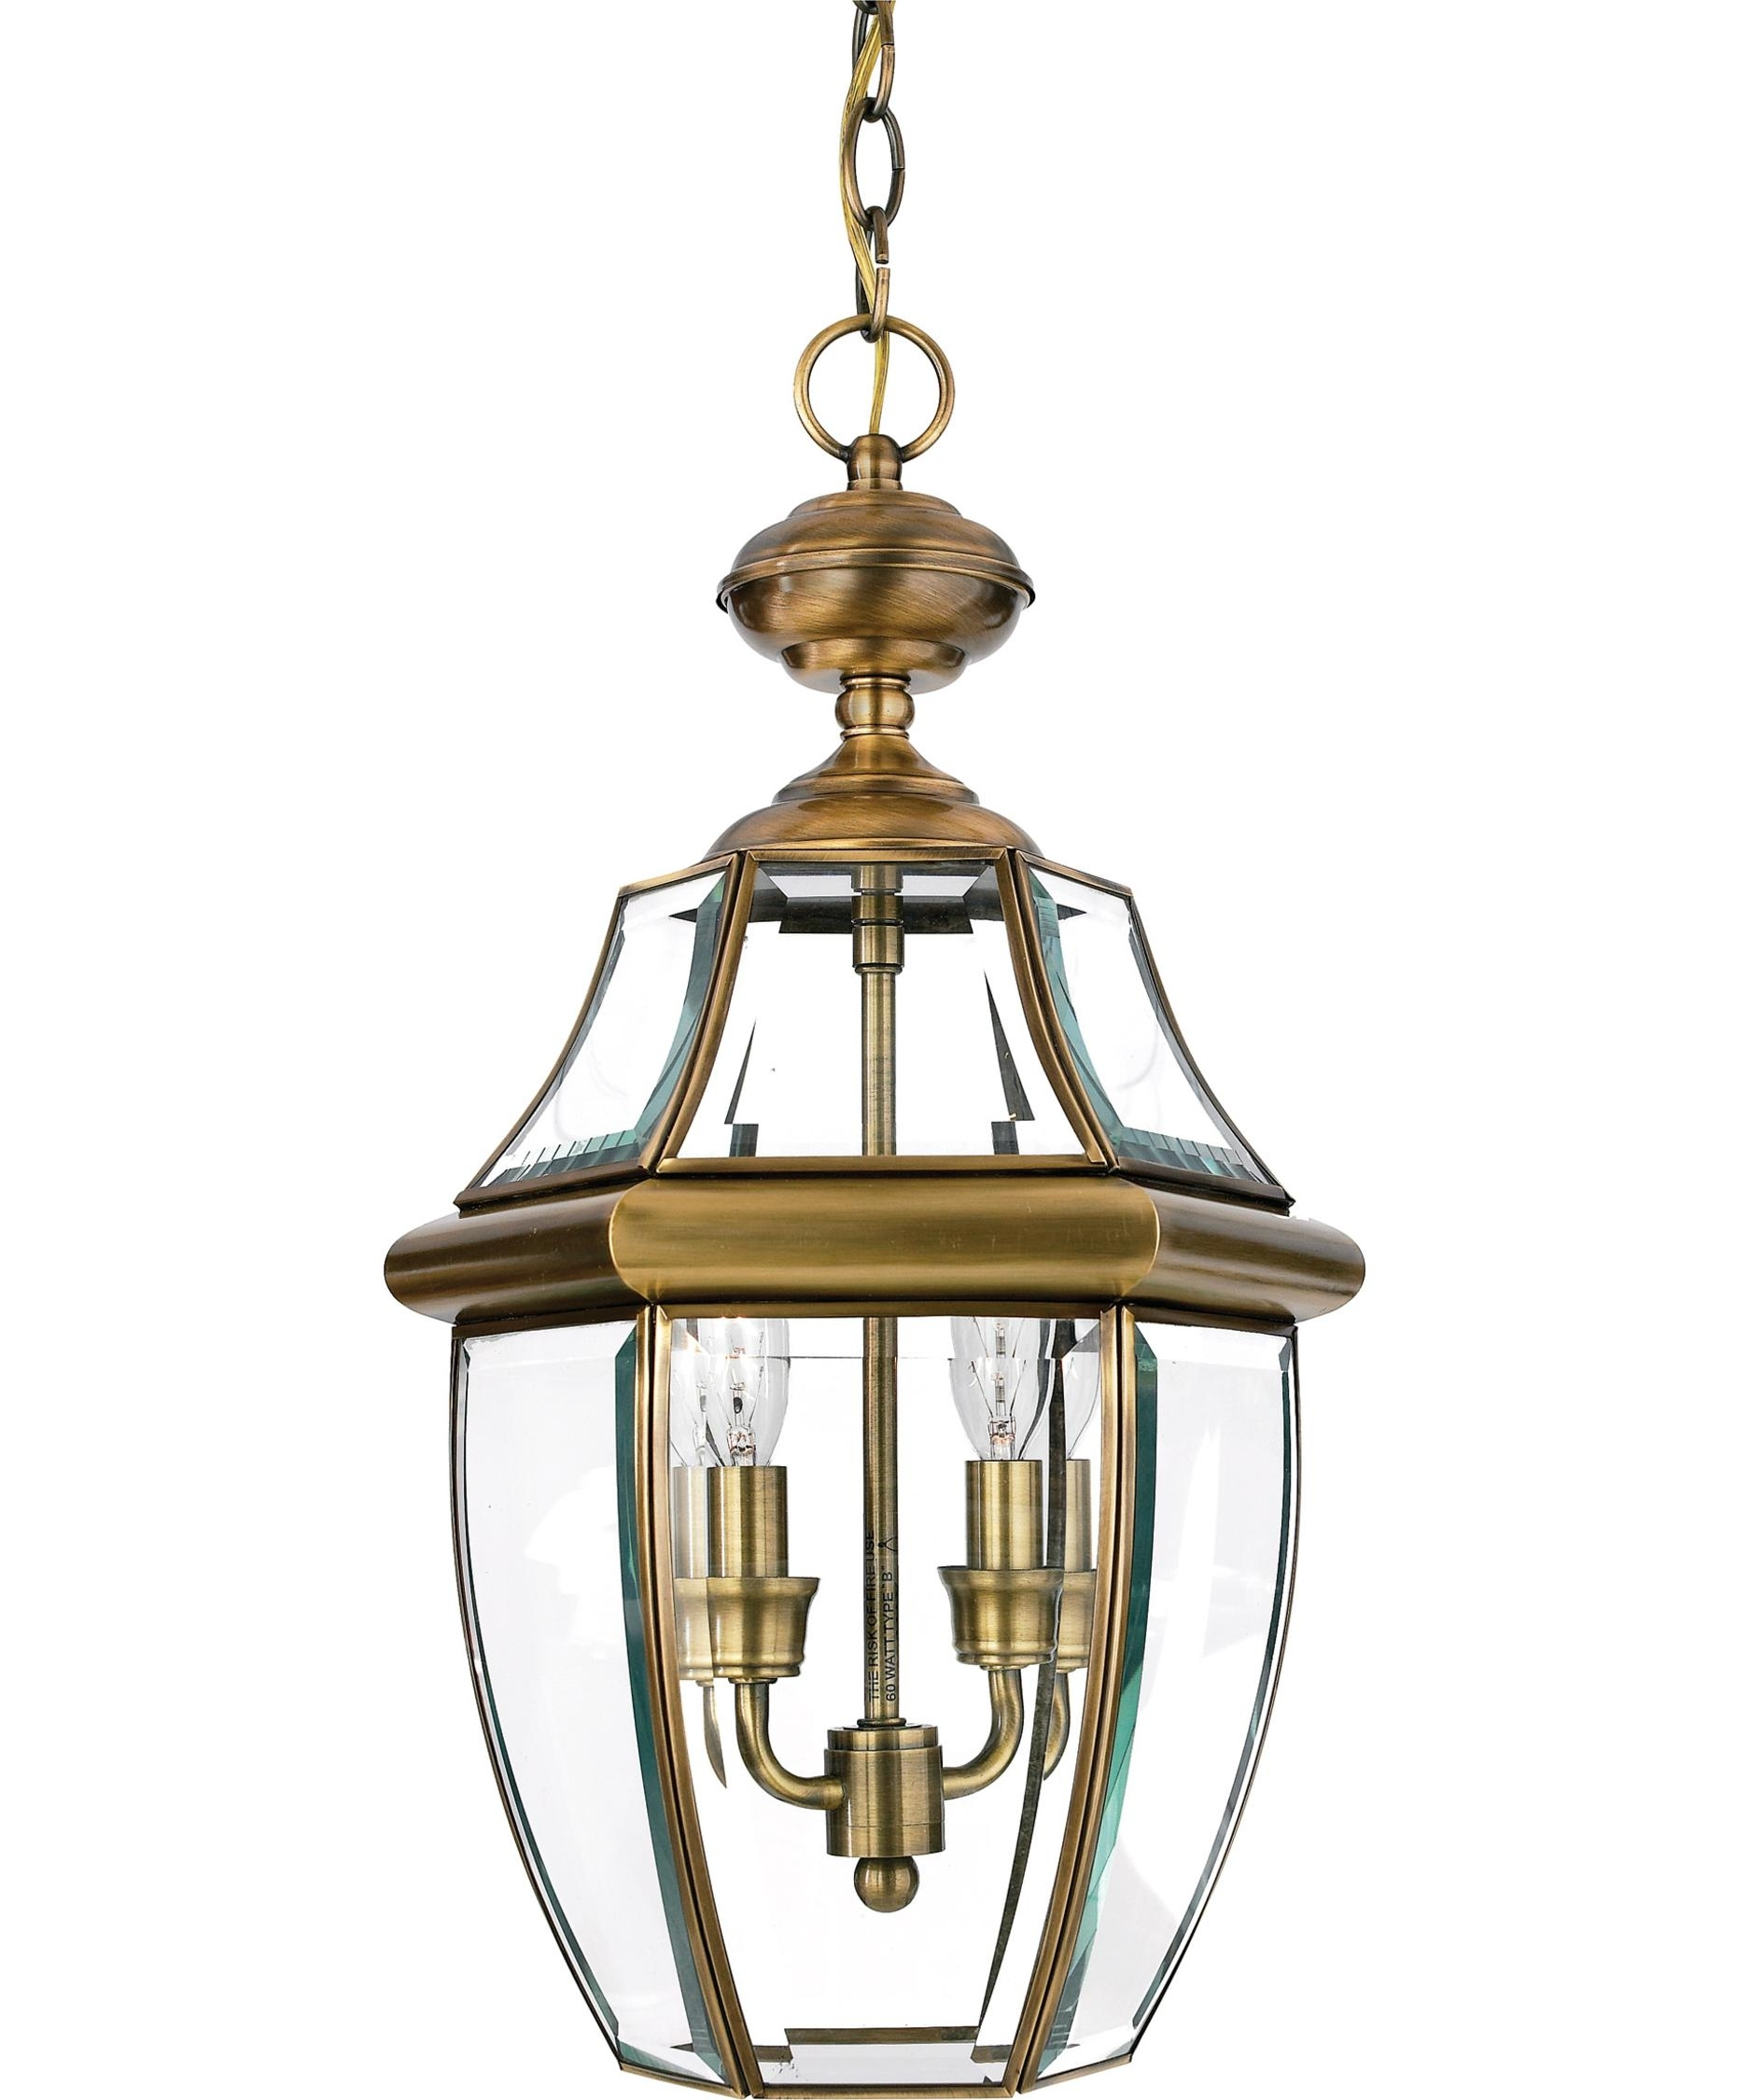 Quoizel Ny1178 Newbury 10 Inch Wide 2 Light Outdoor Hanging Lantern regarding Antique Outdoor Lanterns (Image 15 of 20)